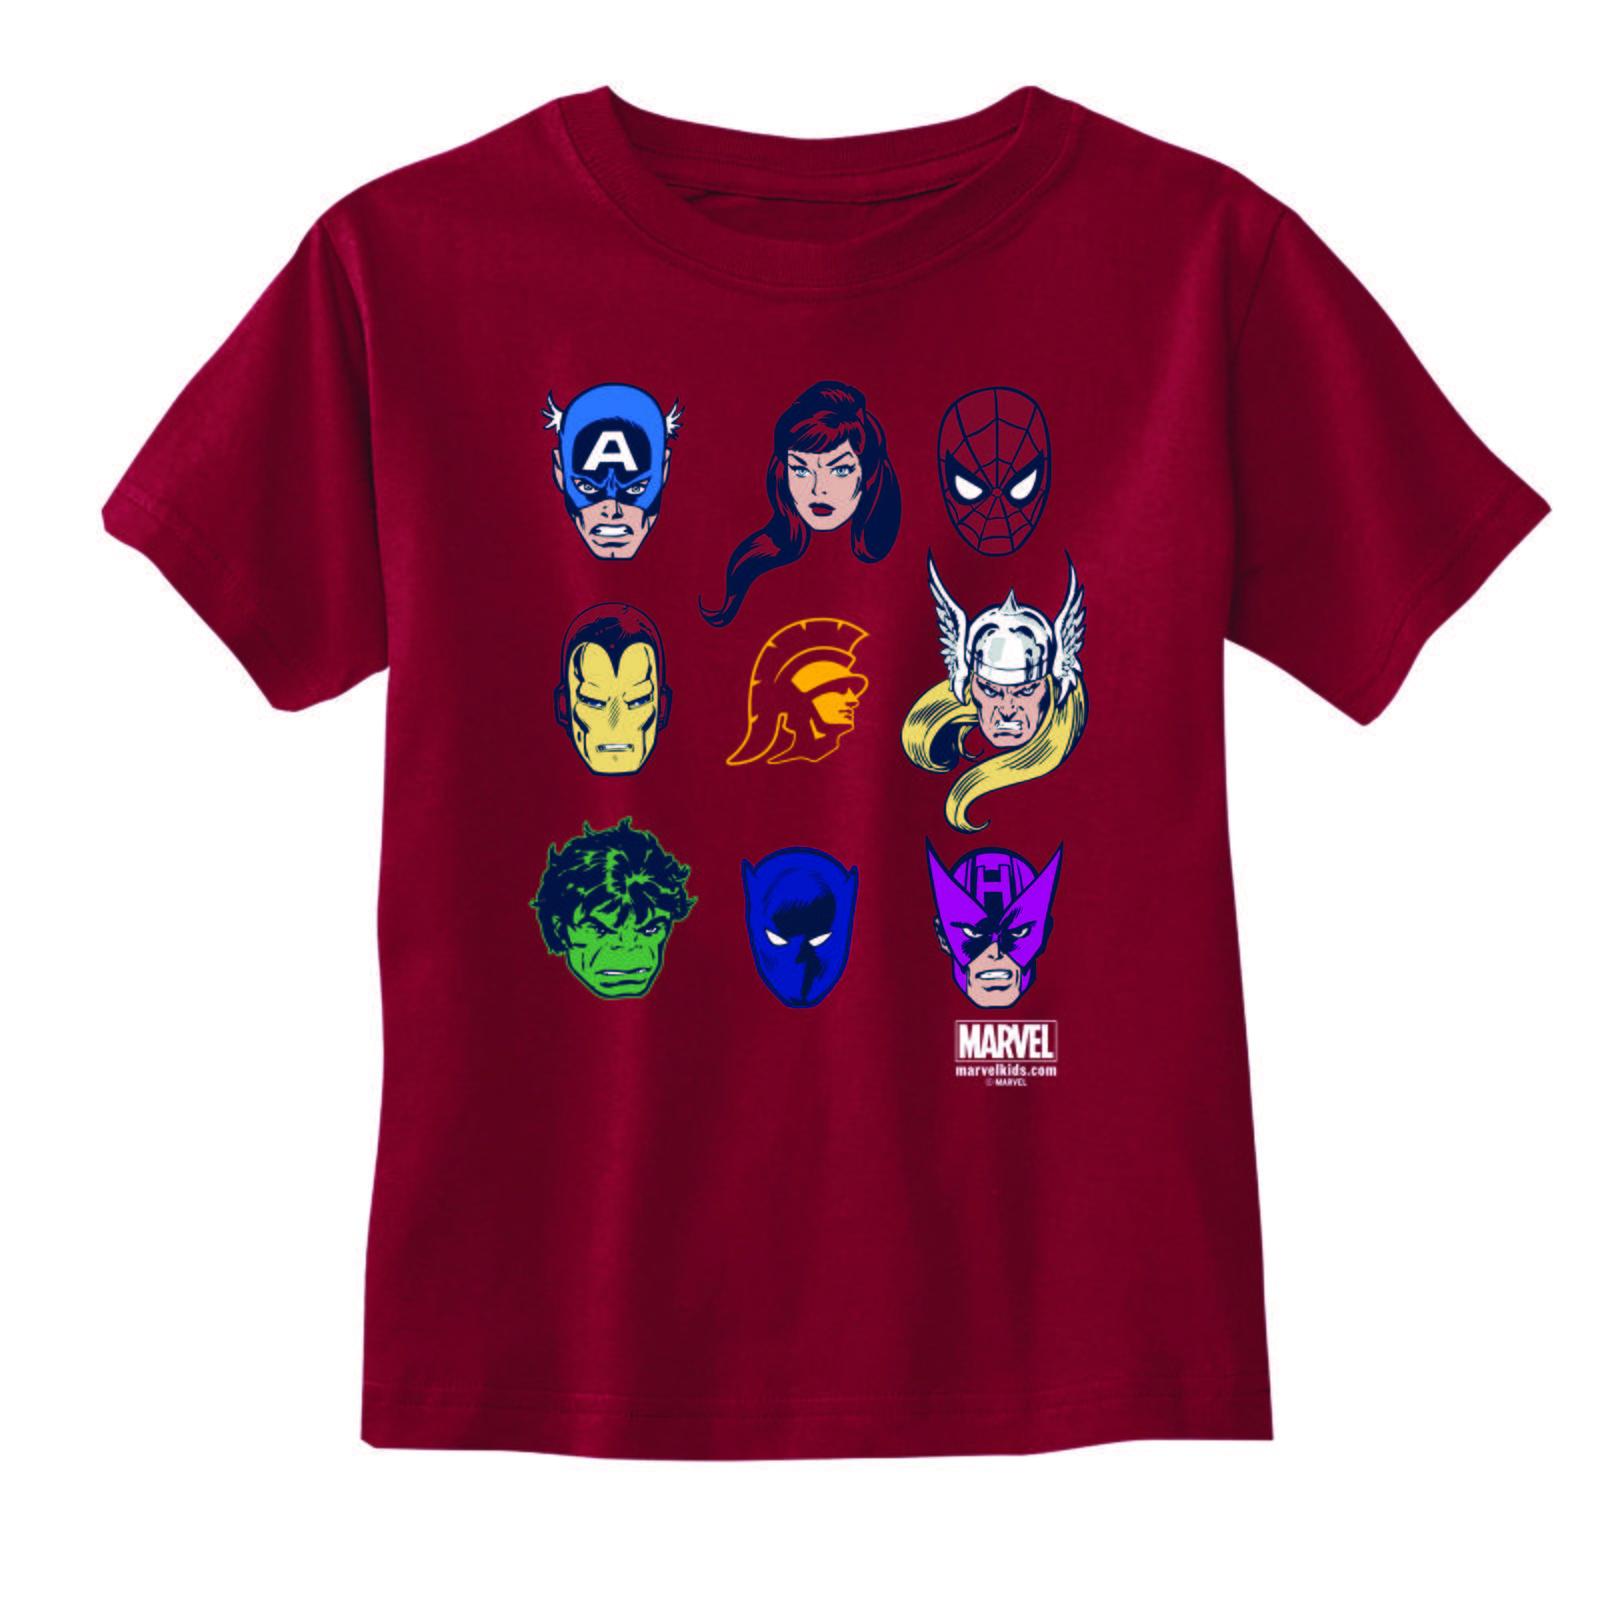 dfbef6c7a0c USC Trojans X Marvel Toddler Tommy Head Super Star Cast T-shirt